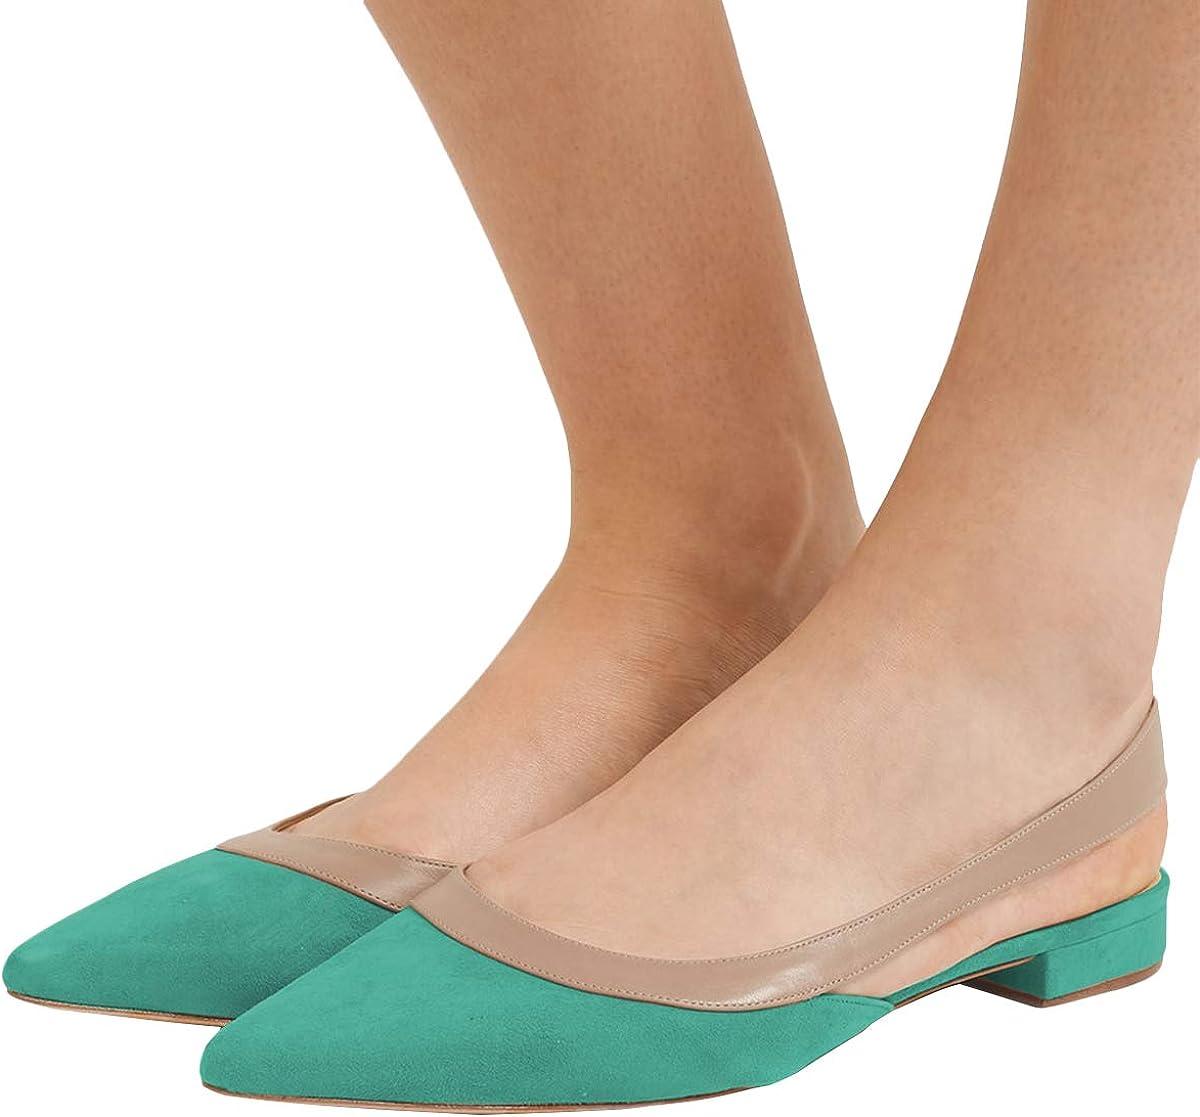 YDN Women Comfortable Pointy Toe Slingback Flats Faux Suede Low Heel Slip On Easy Walking Dress Sandals